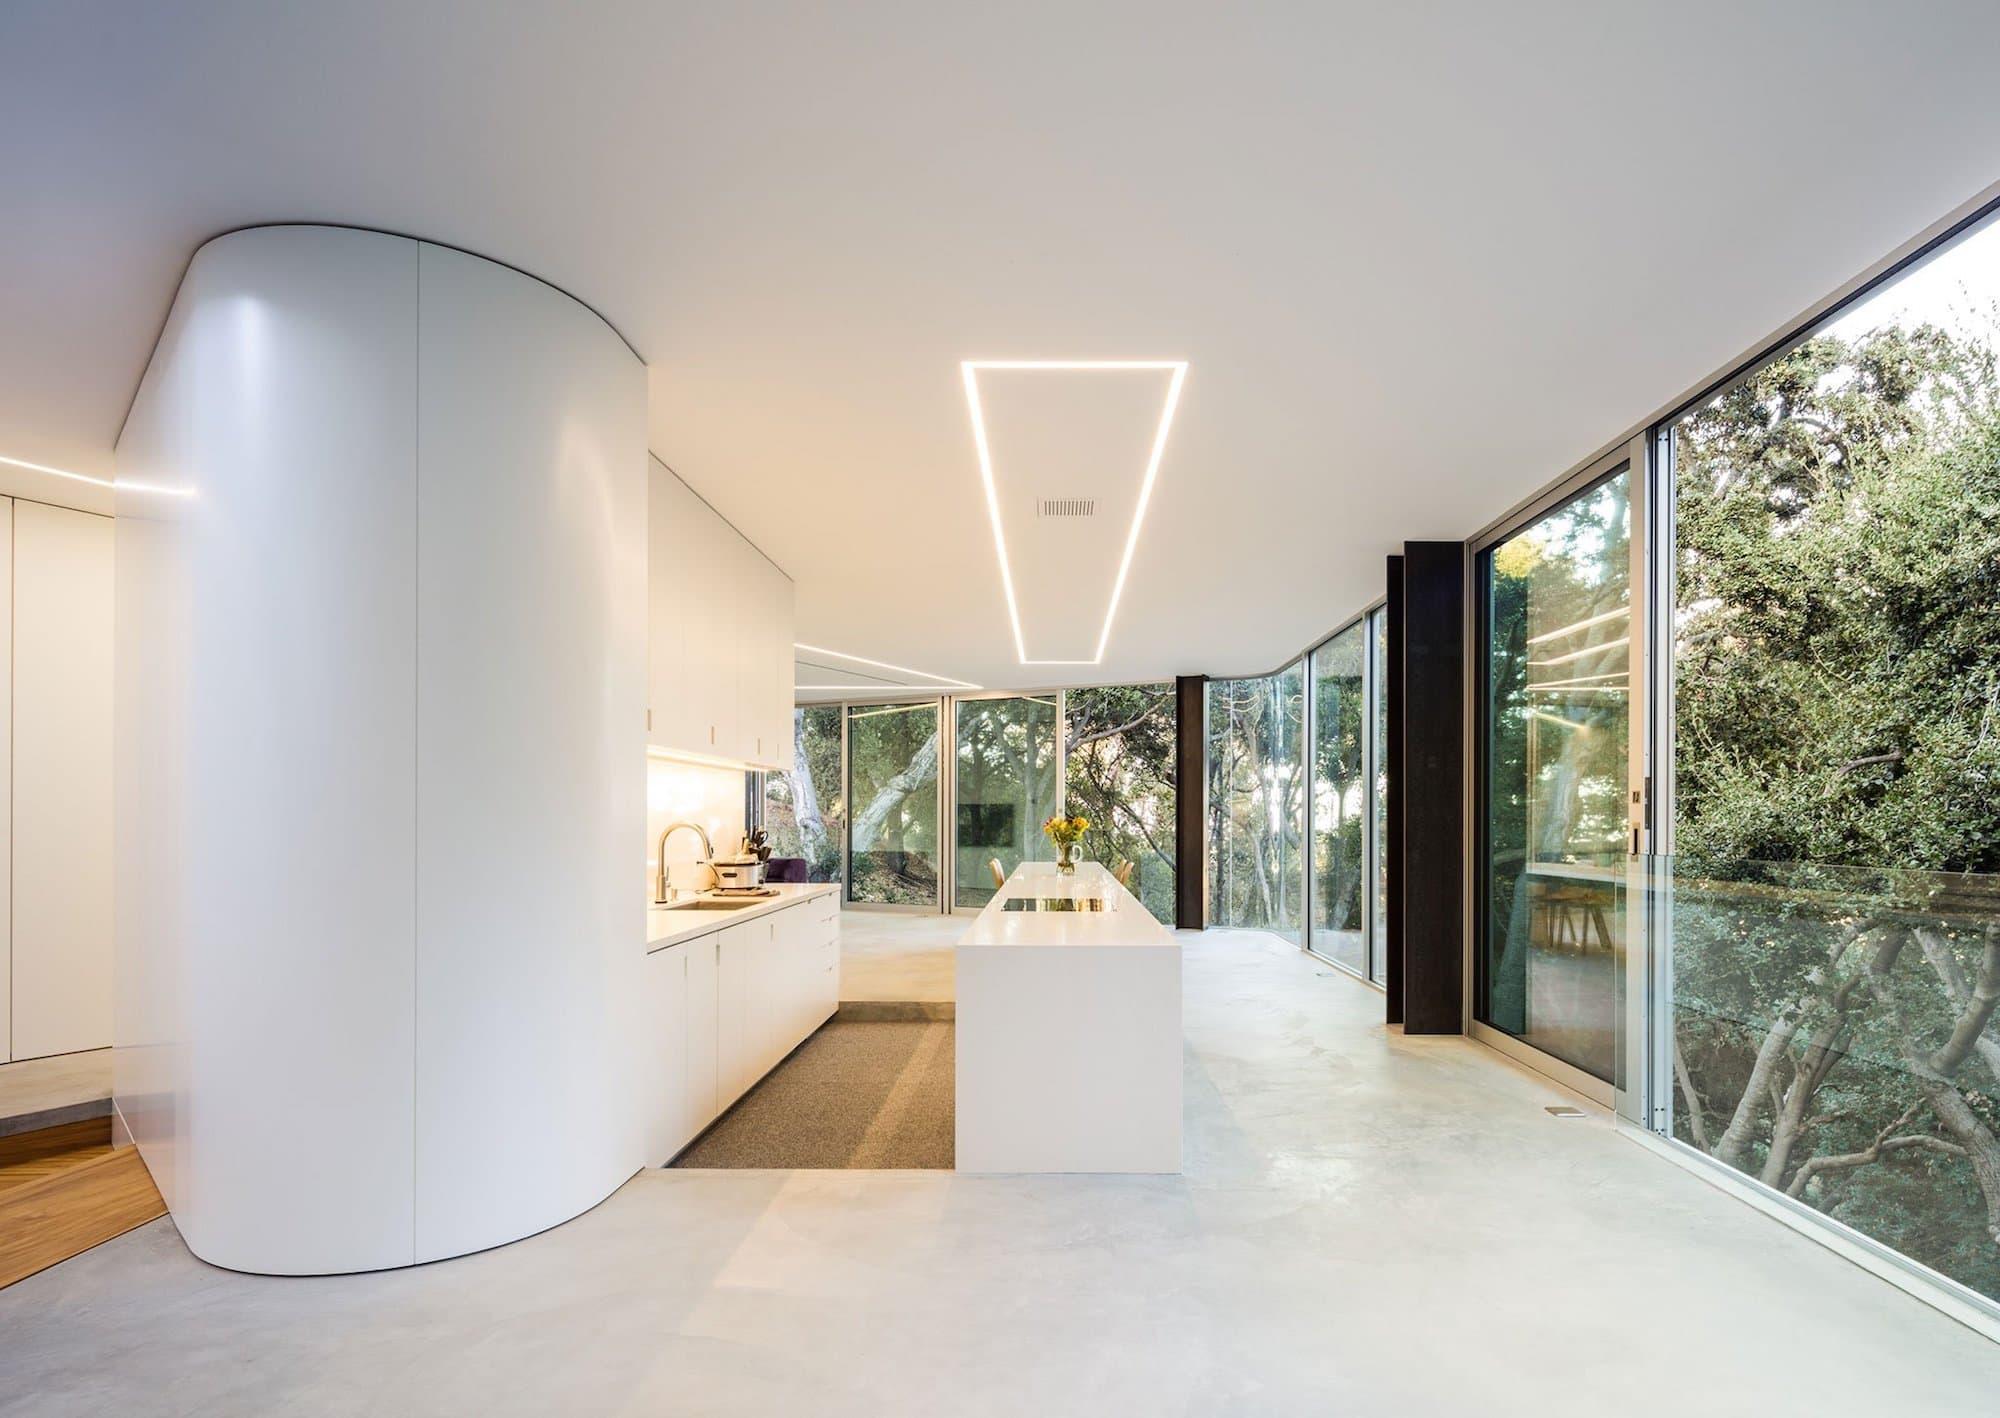 Licht ist Leben: Pam & Paul's House by Craig Steely Architecture 9